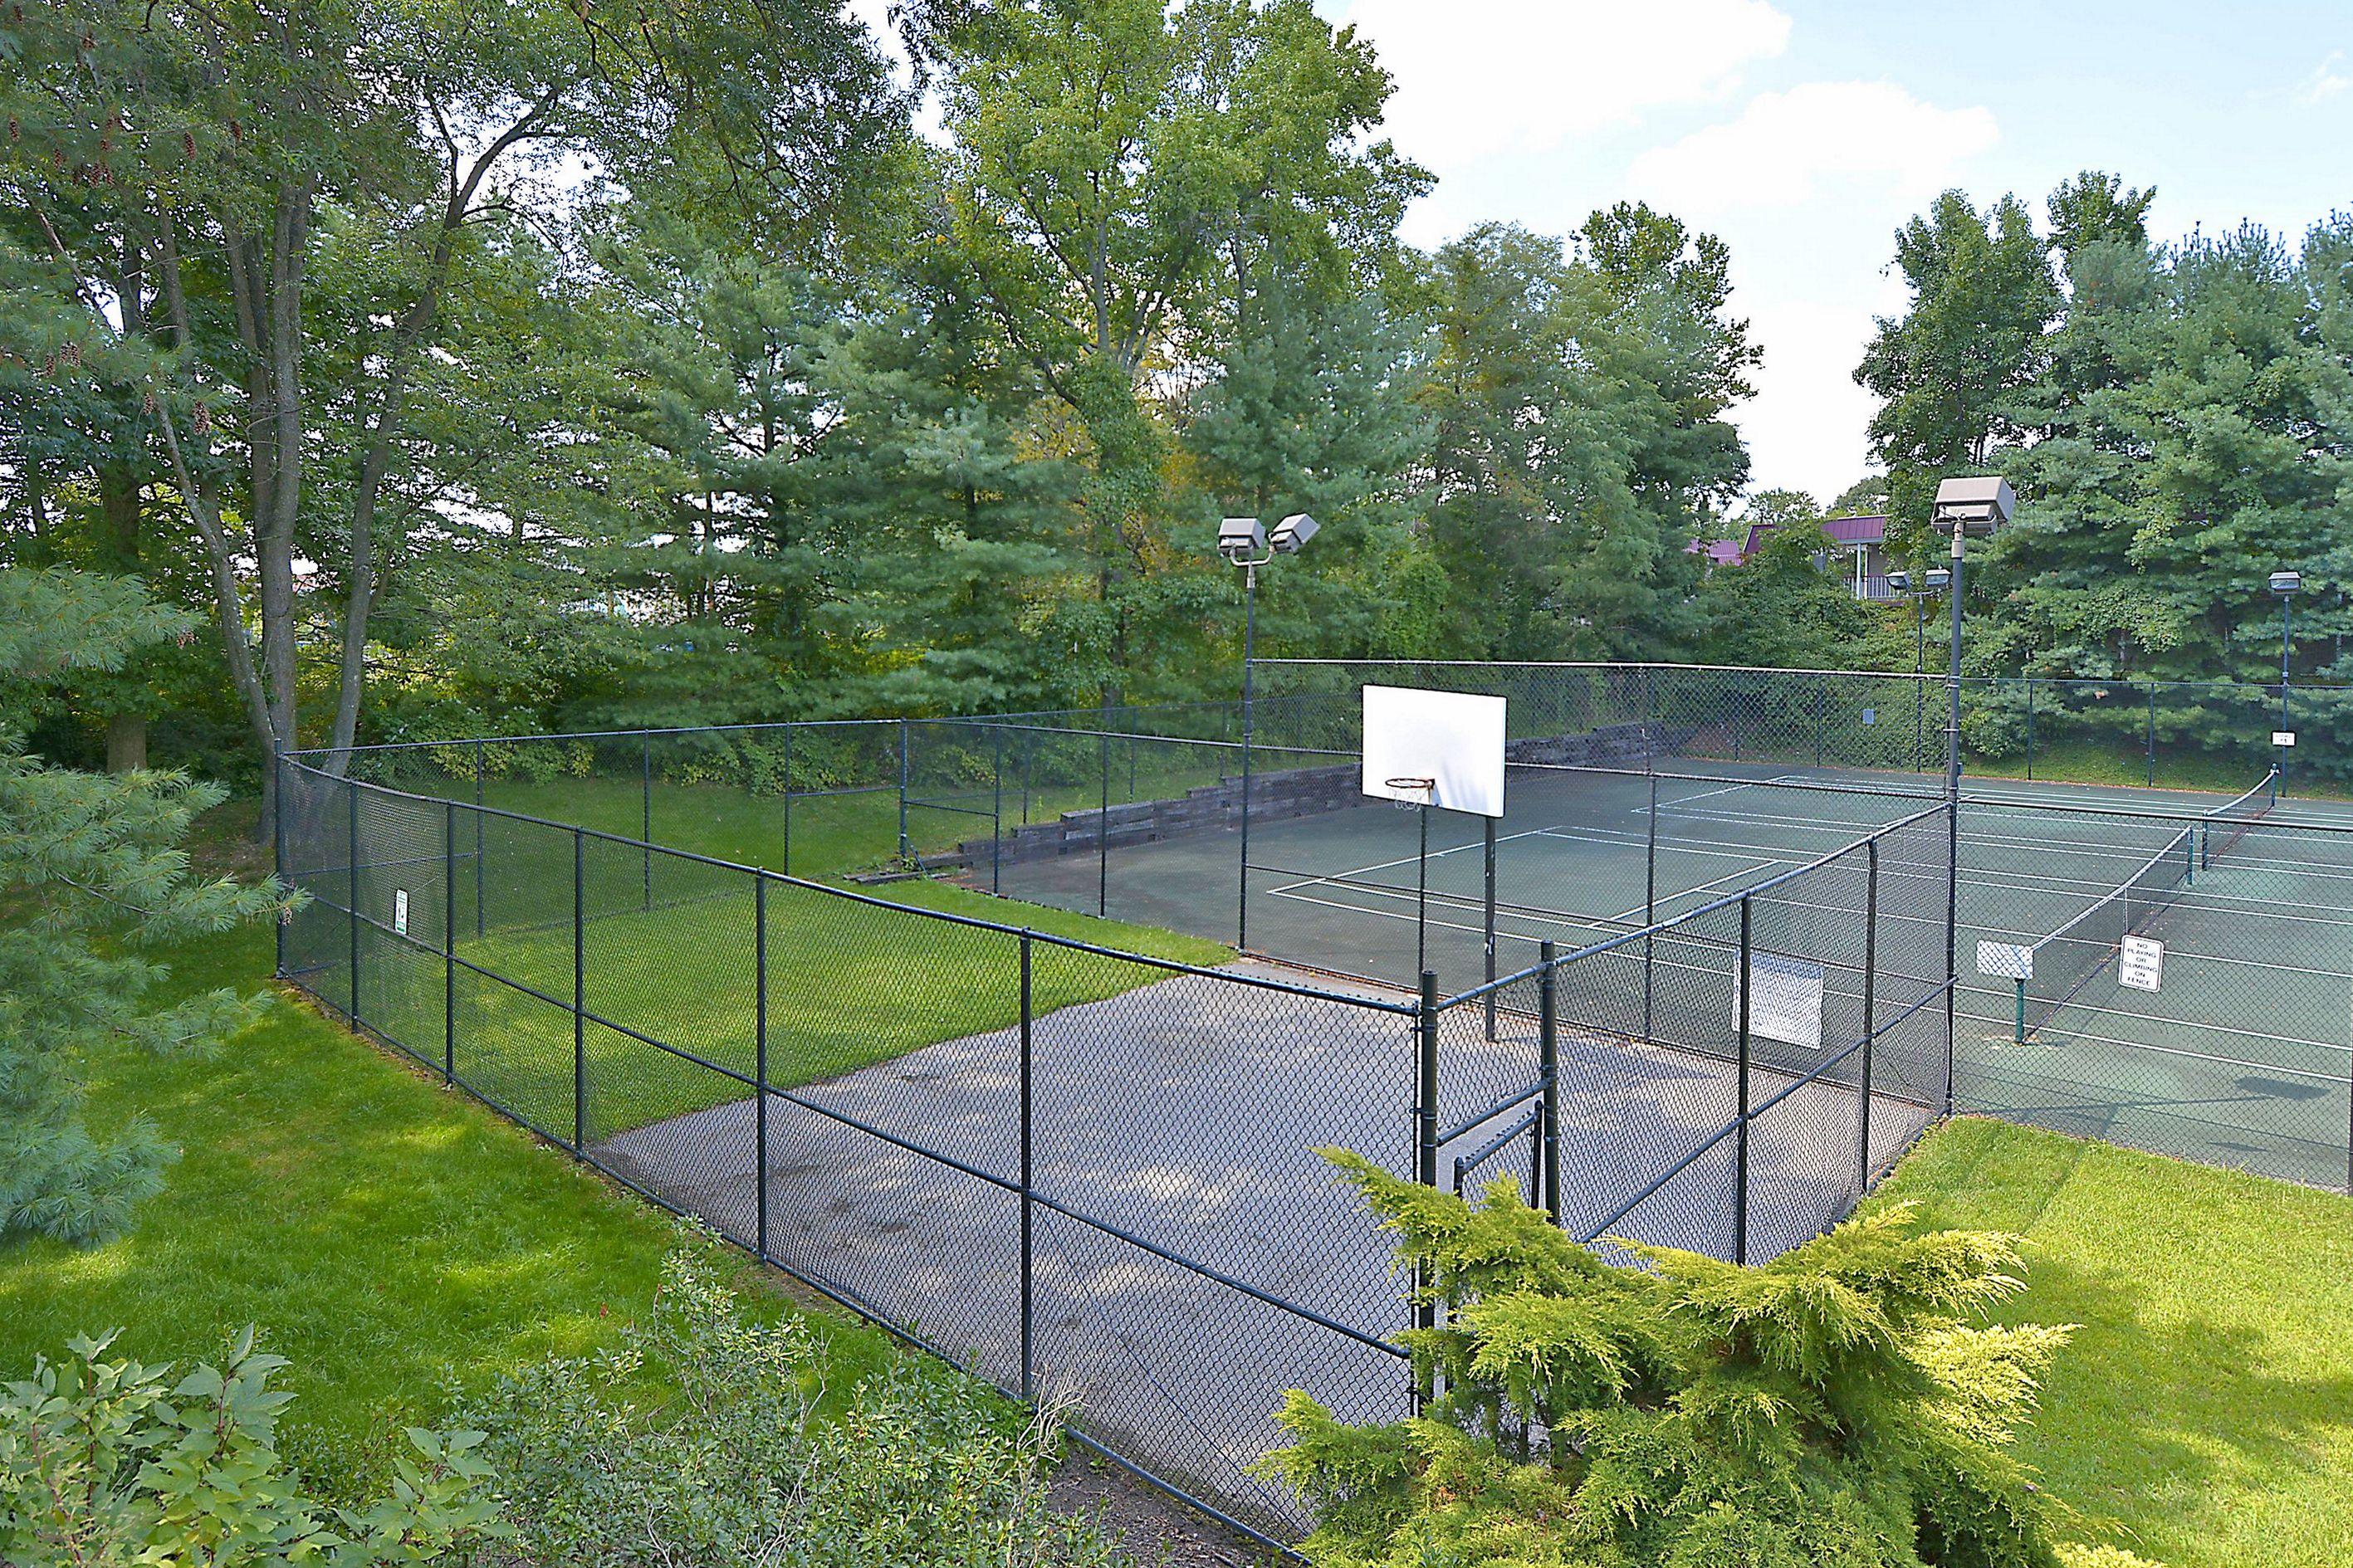 Seven Oaks Odenton basketball